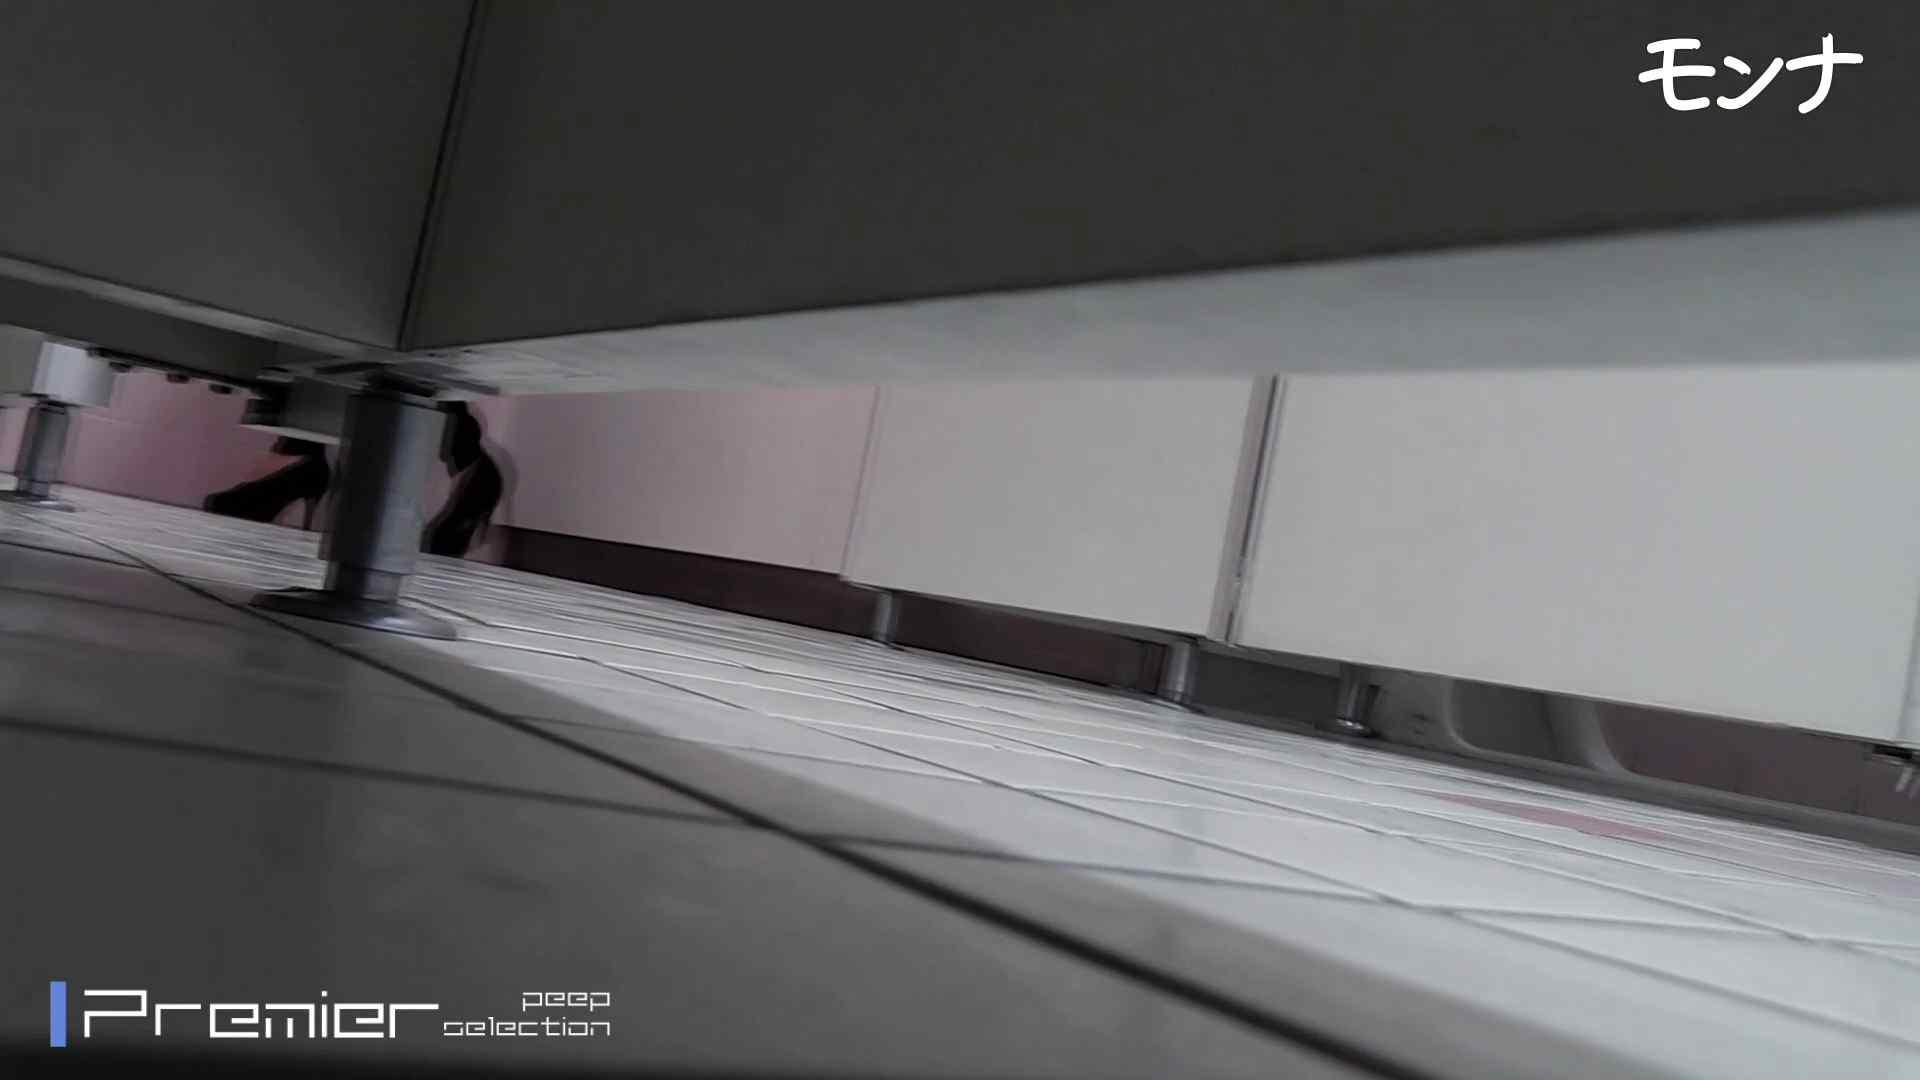 CM 悶絶シリーズ5 【美しい日本の未来 No.128】 丸見え  111枚 110